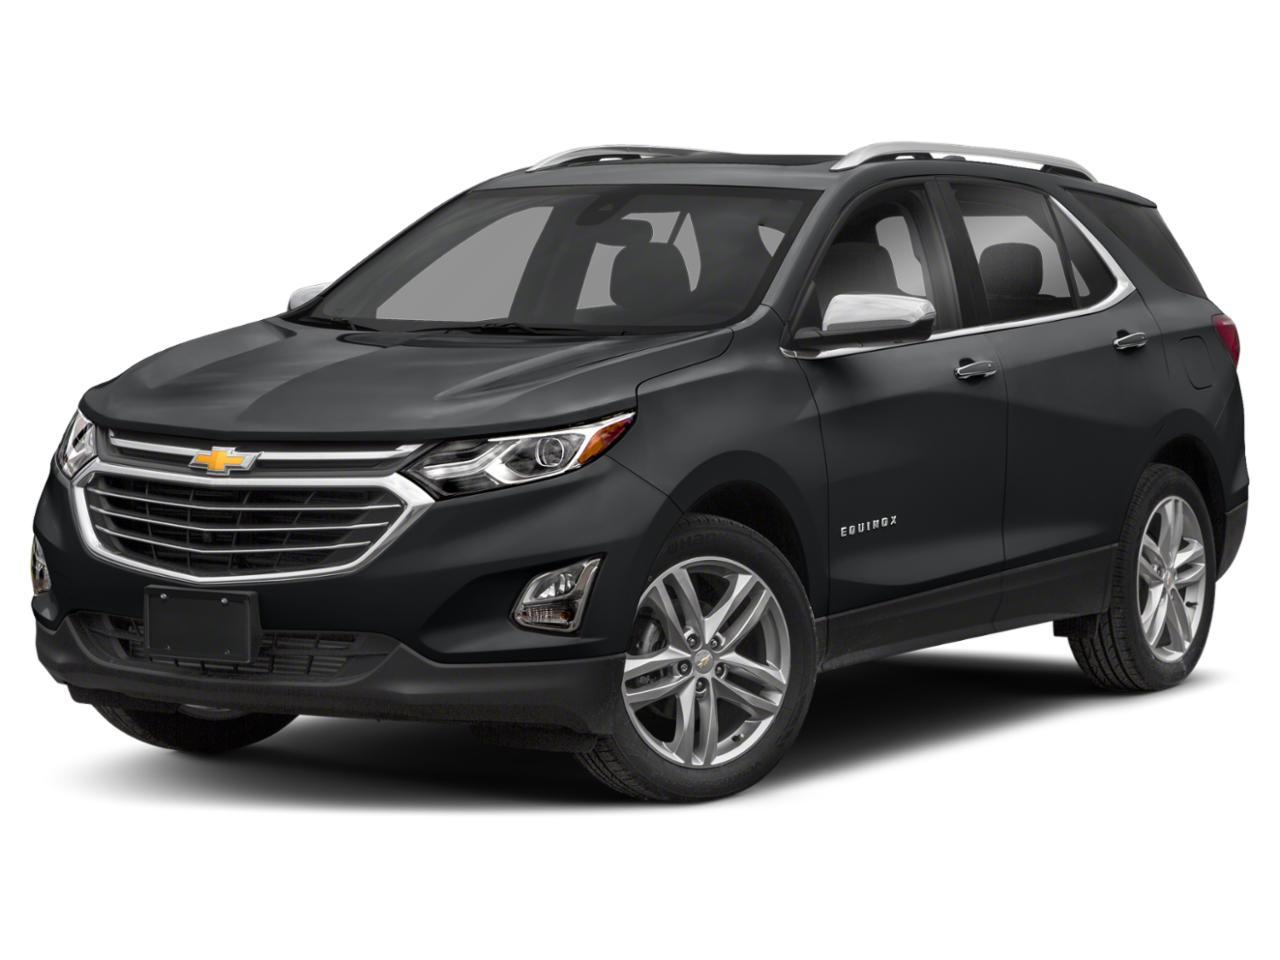 2020 Chevrolet Equinox Vehicle Photo in Lubbock, TX 79412